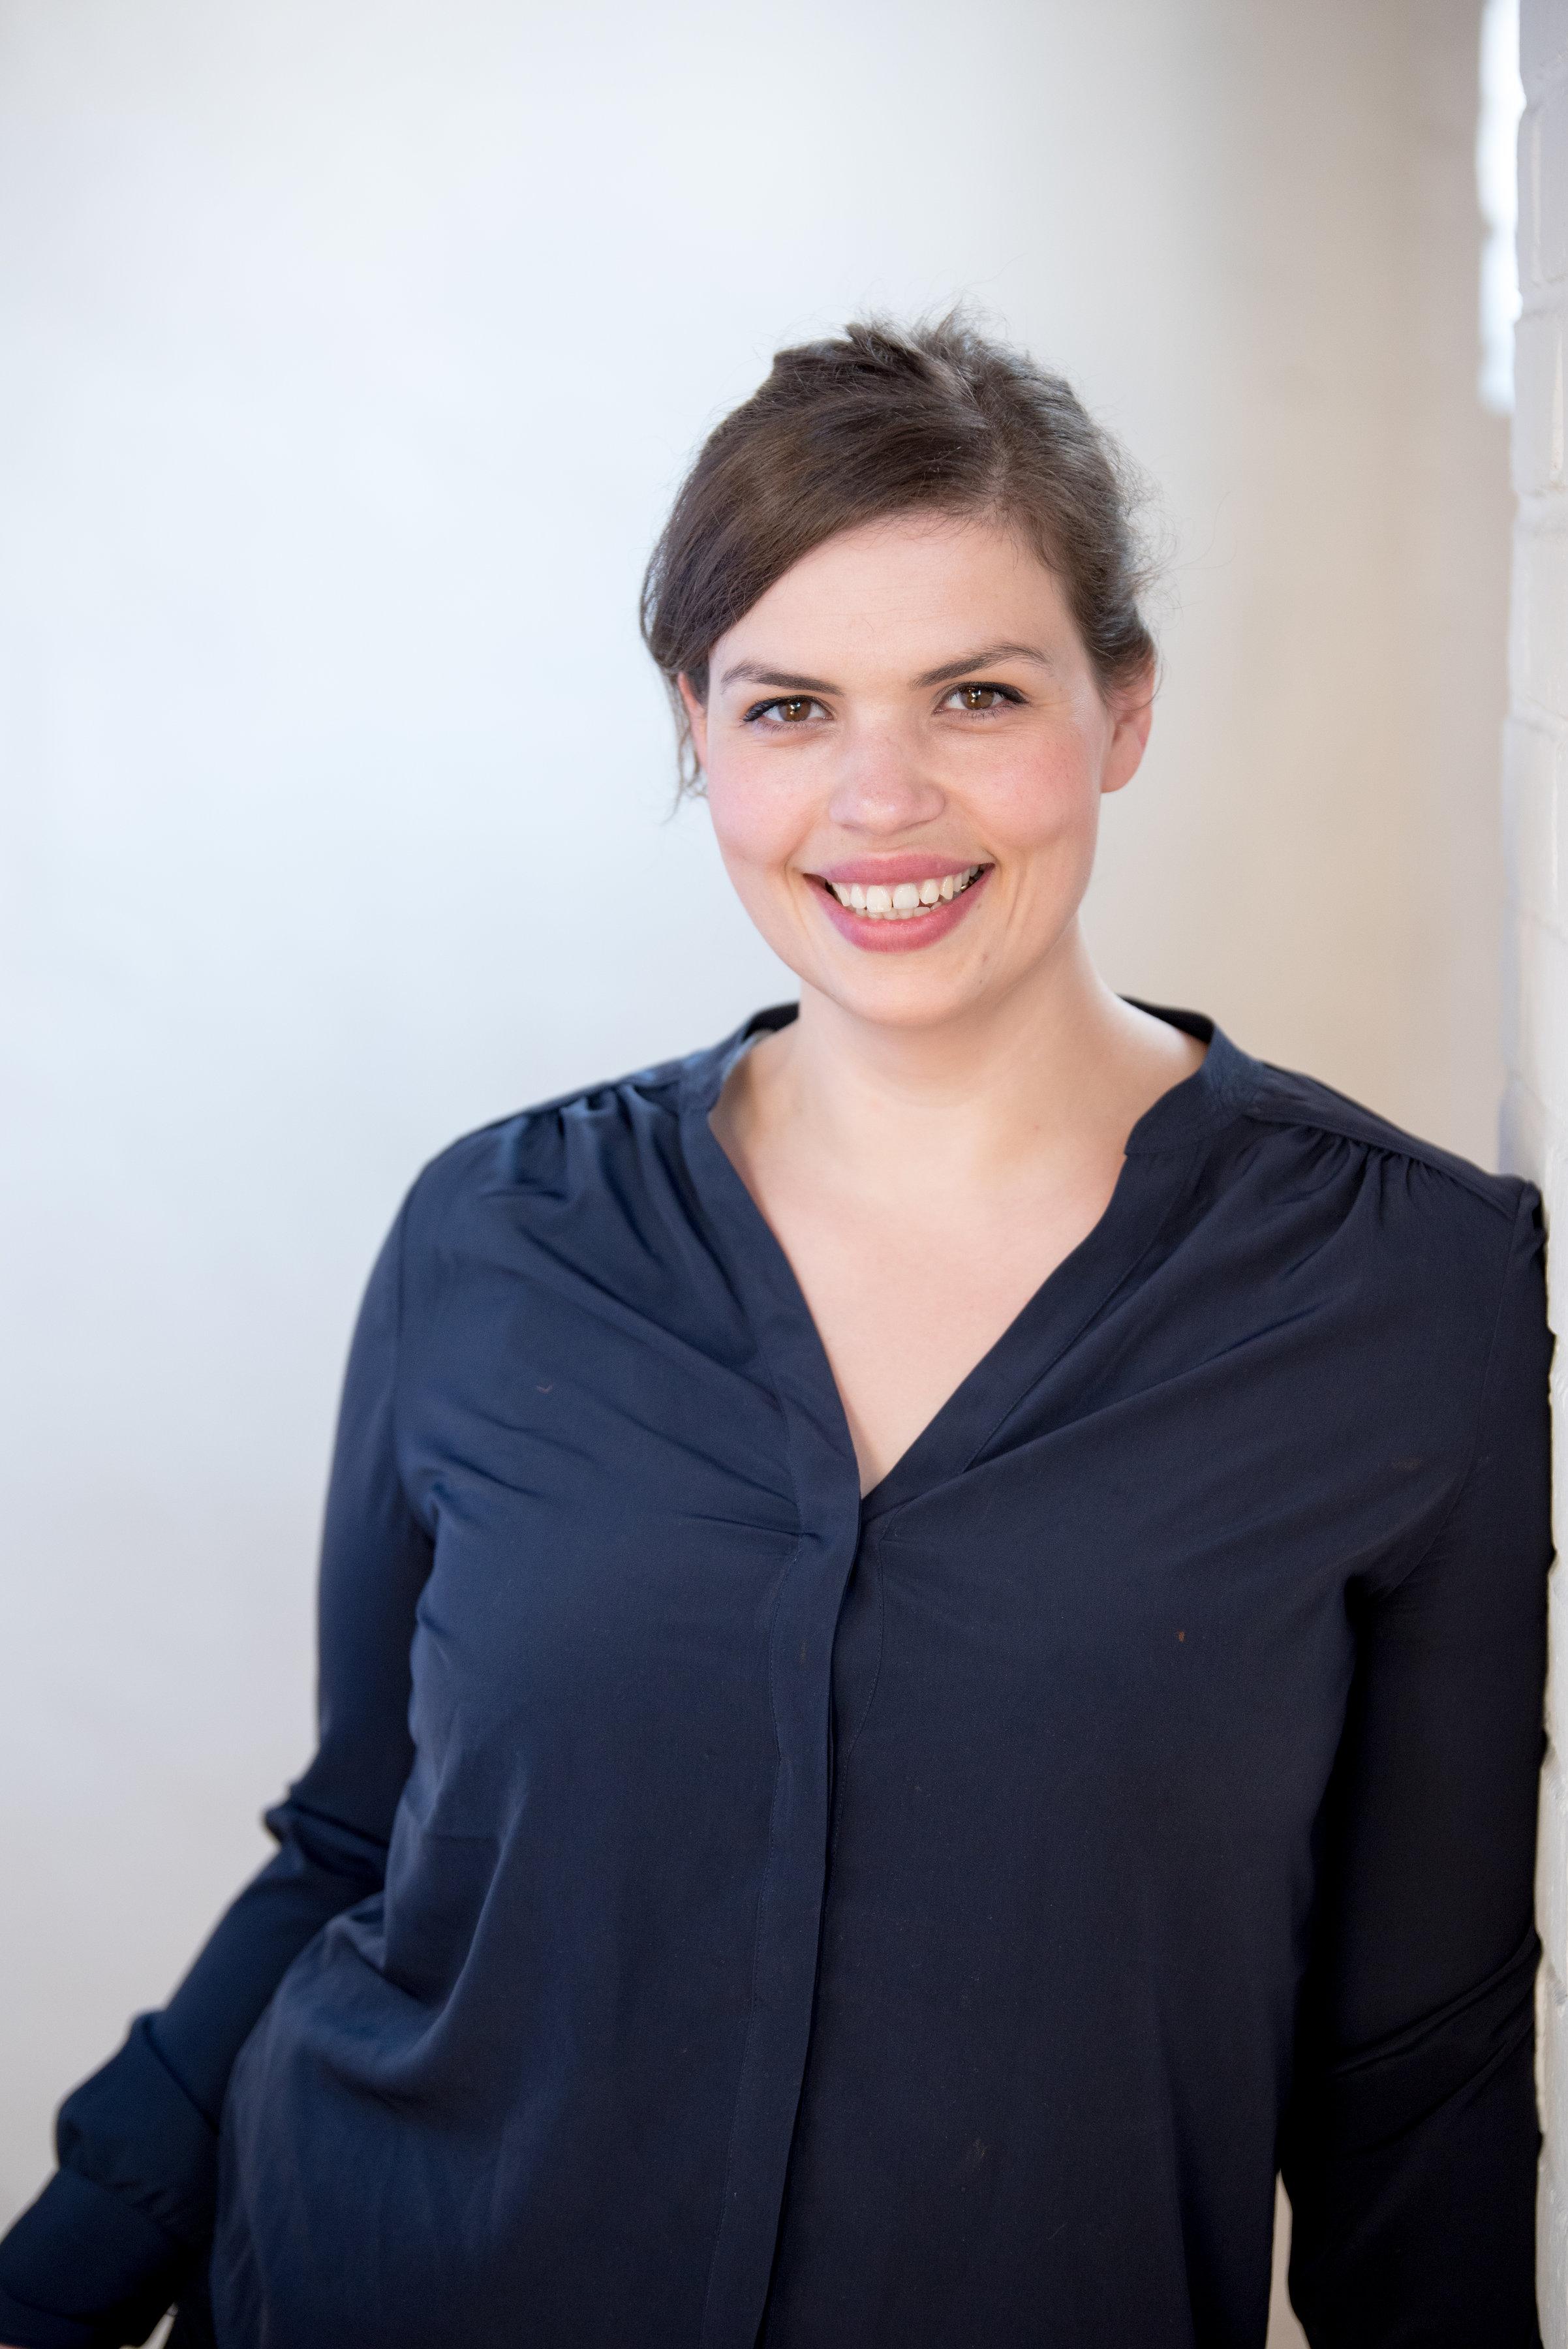 Daphne Harman-Clarke M.Ost DPO